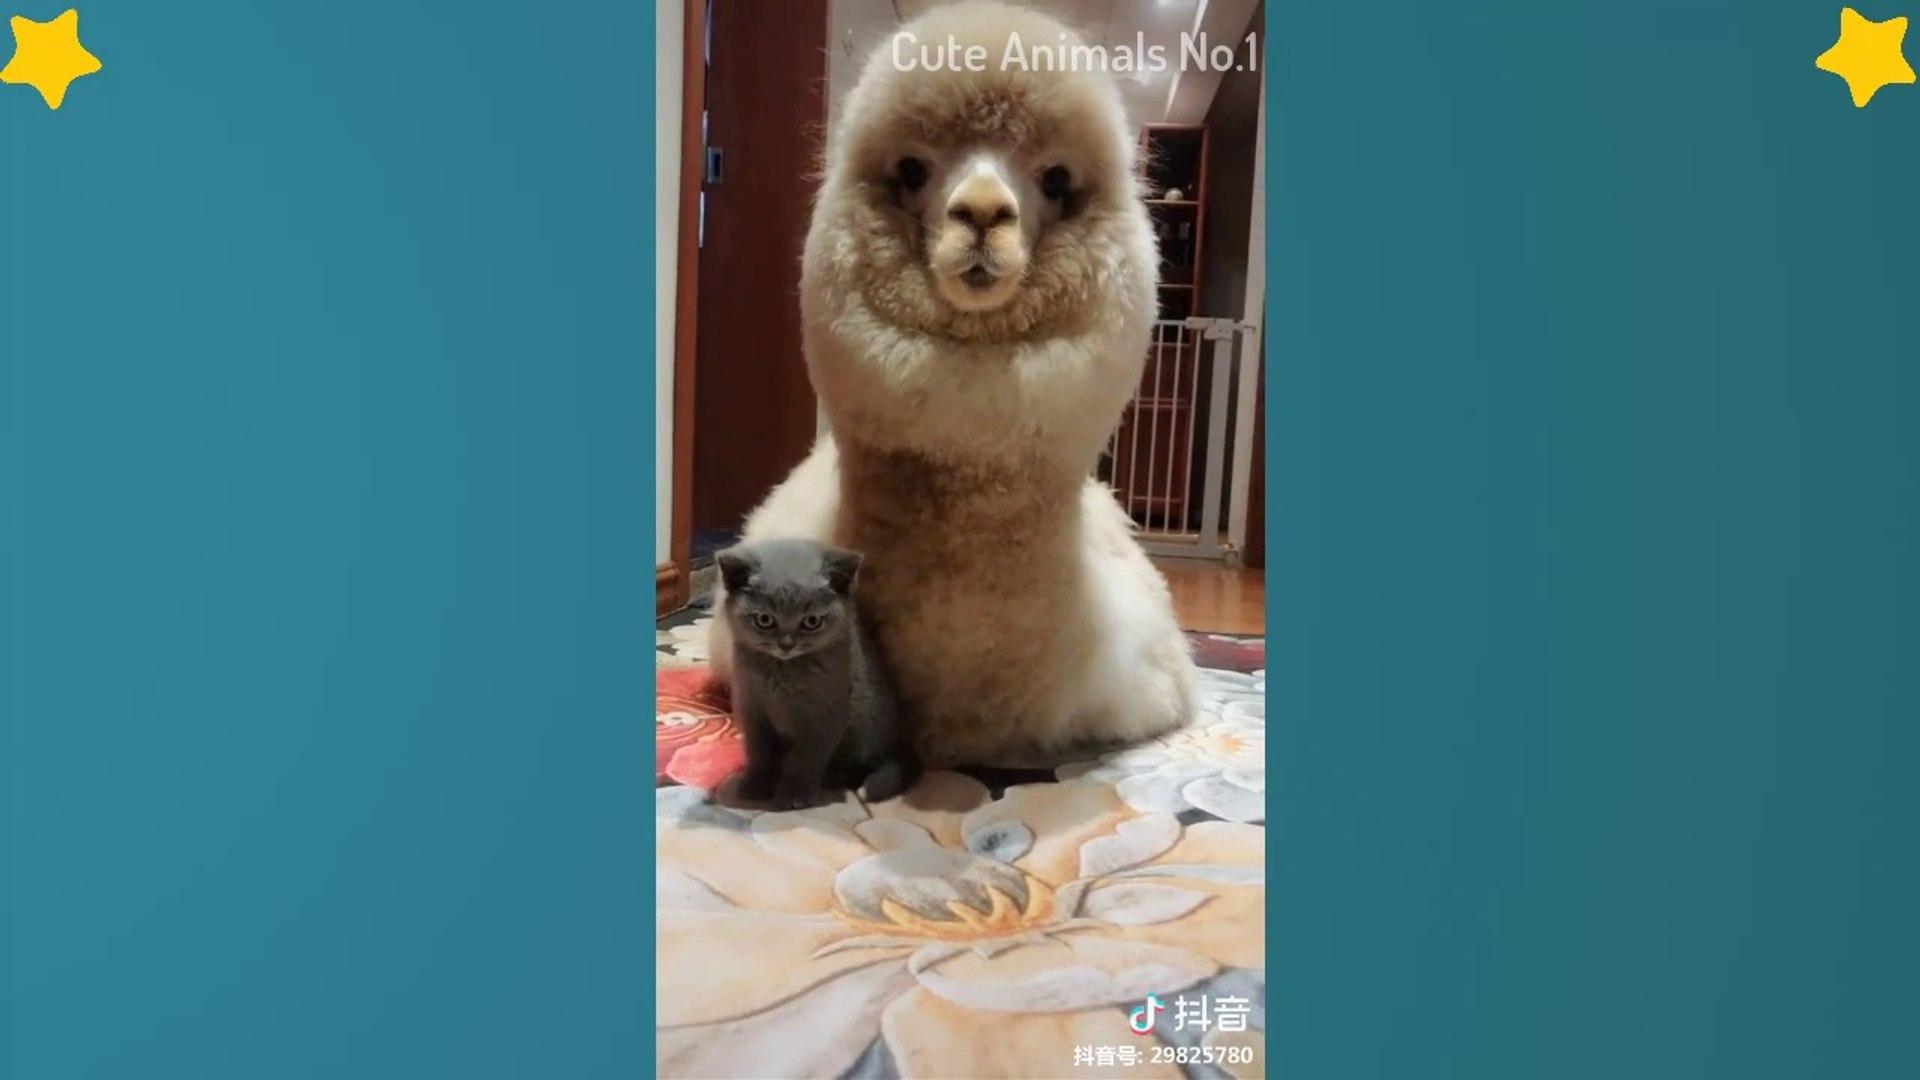 Tiktok Cat - Tik Tok Pets - Tik Tok Funny Dog - Tik Tok Animals #20